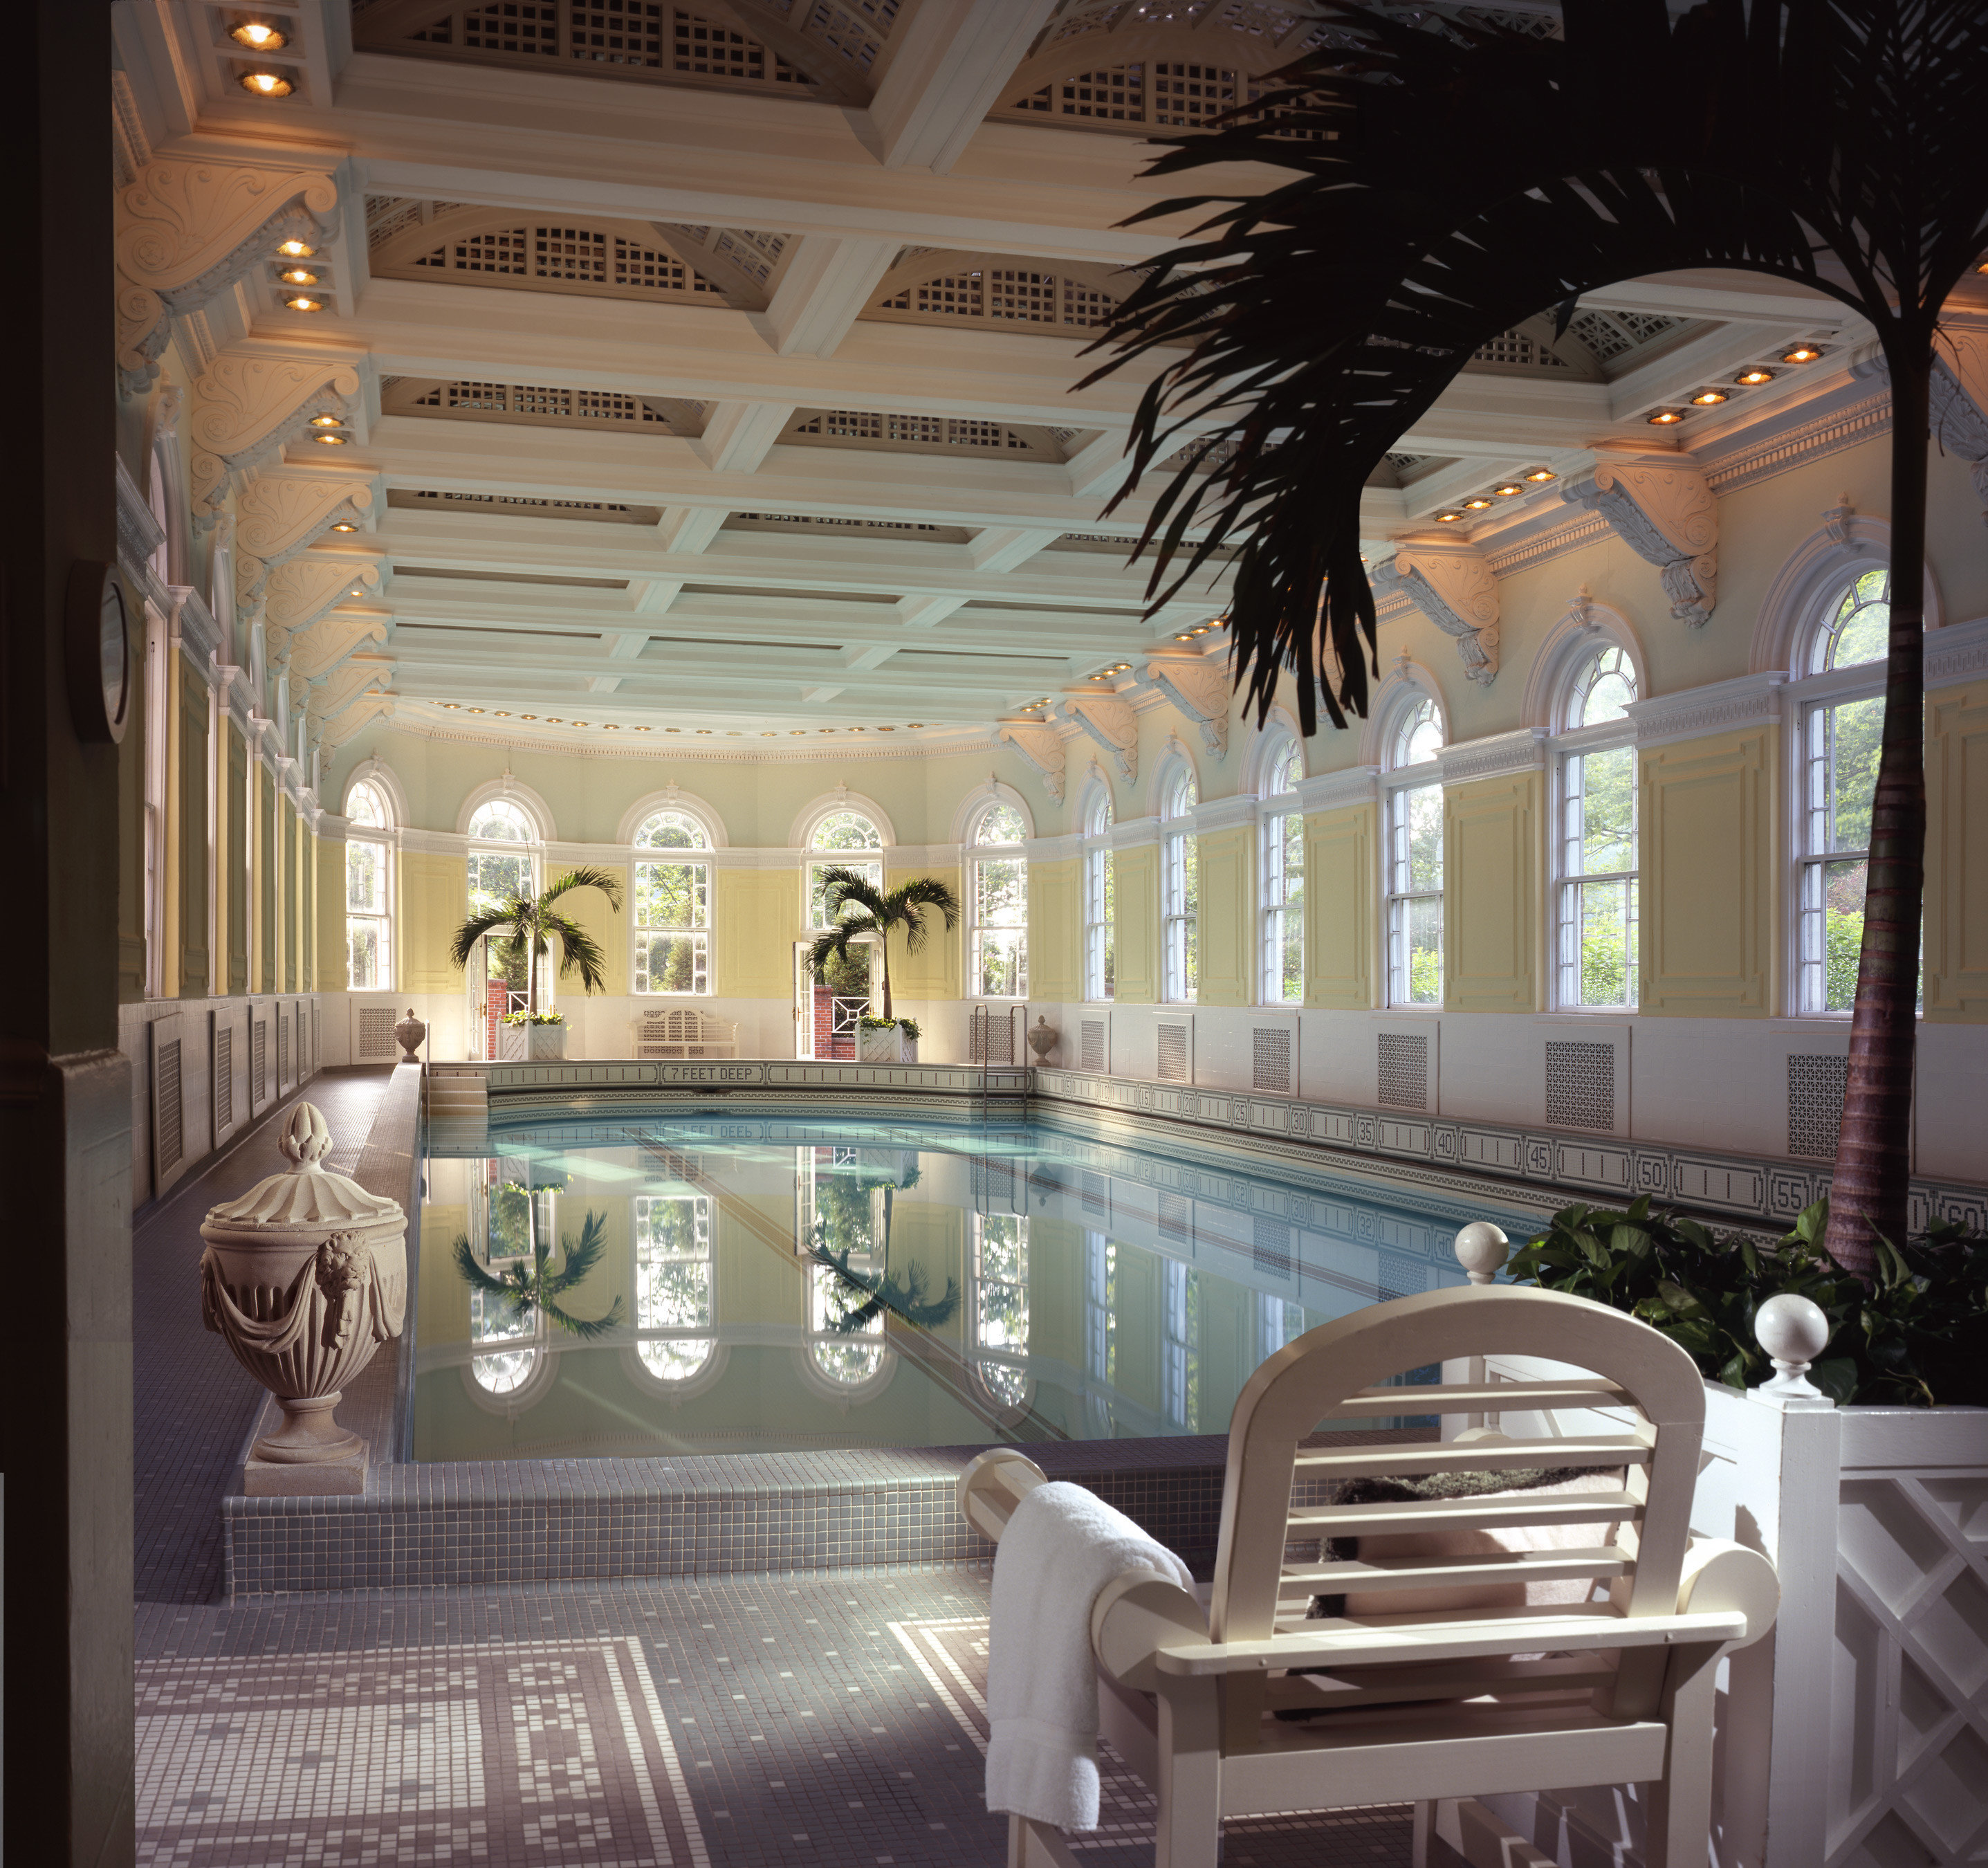 Romance Trip Ideas Weekend Getaways swimming pool interior design estate Lobby ceiling hotel condominium amenity furniture